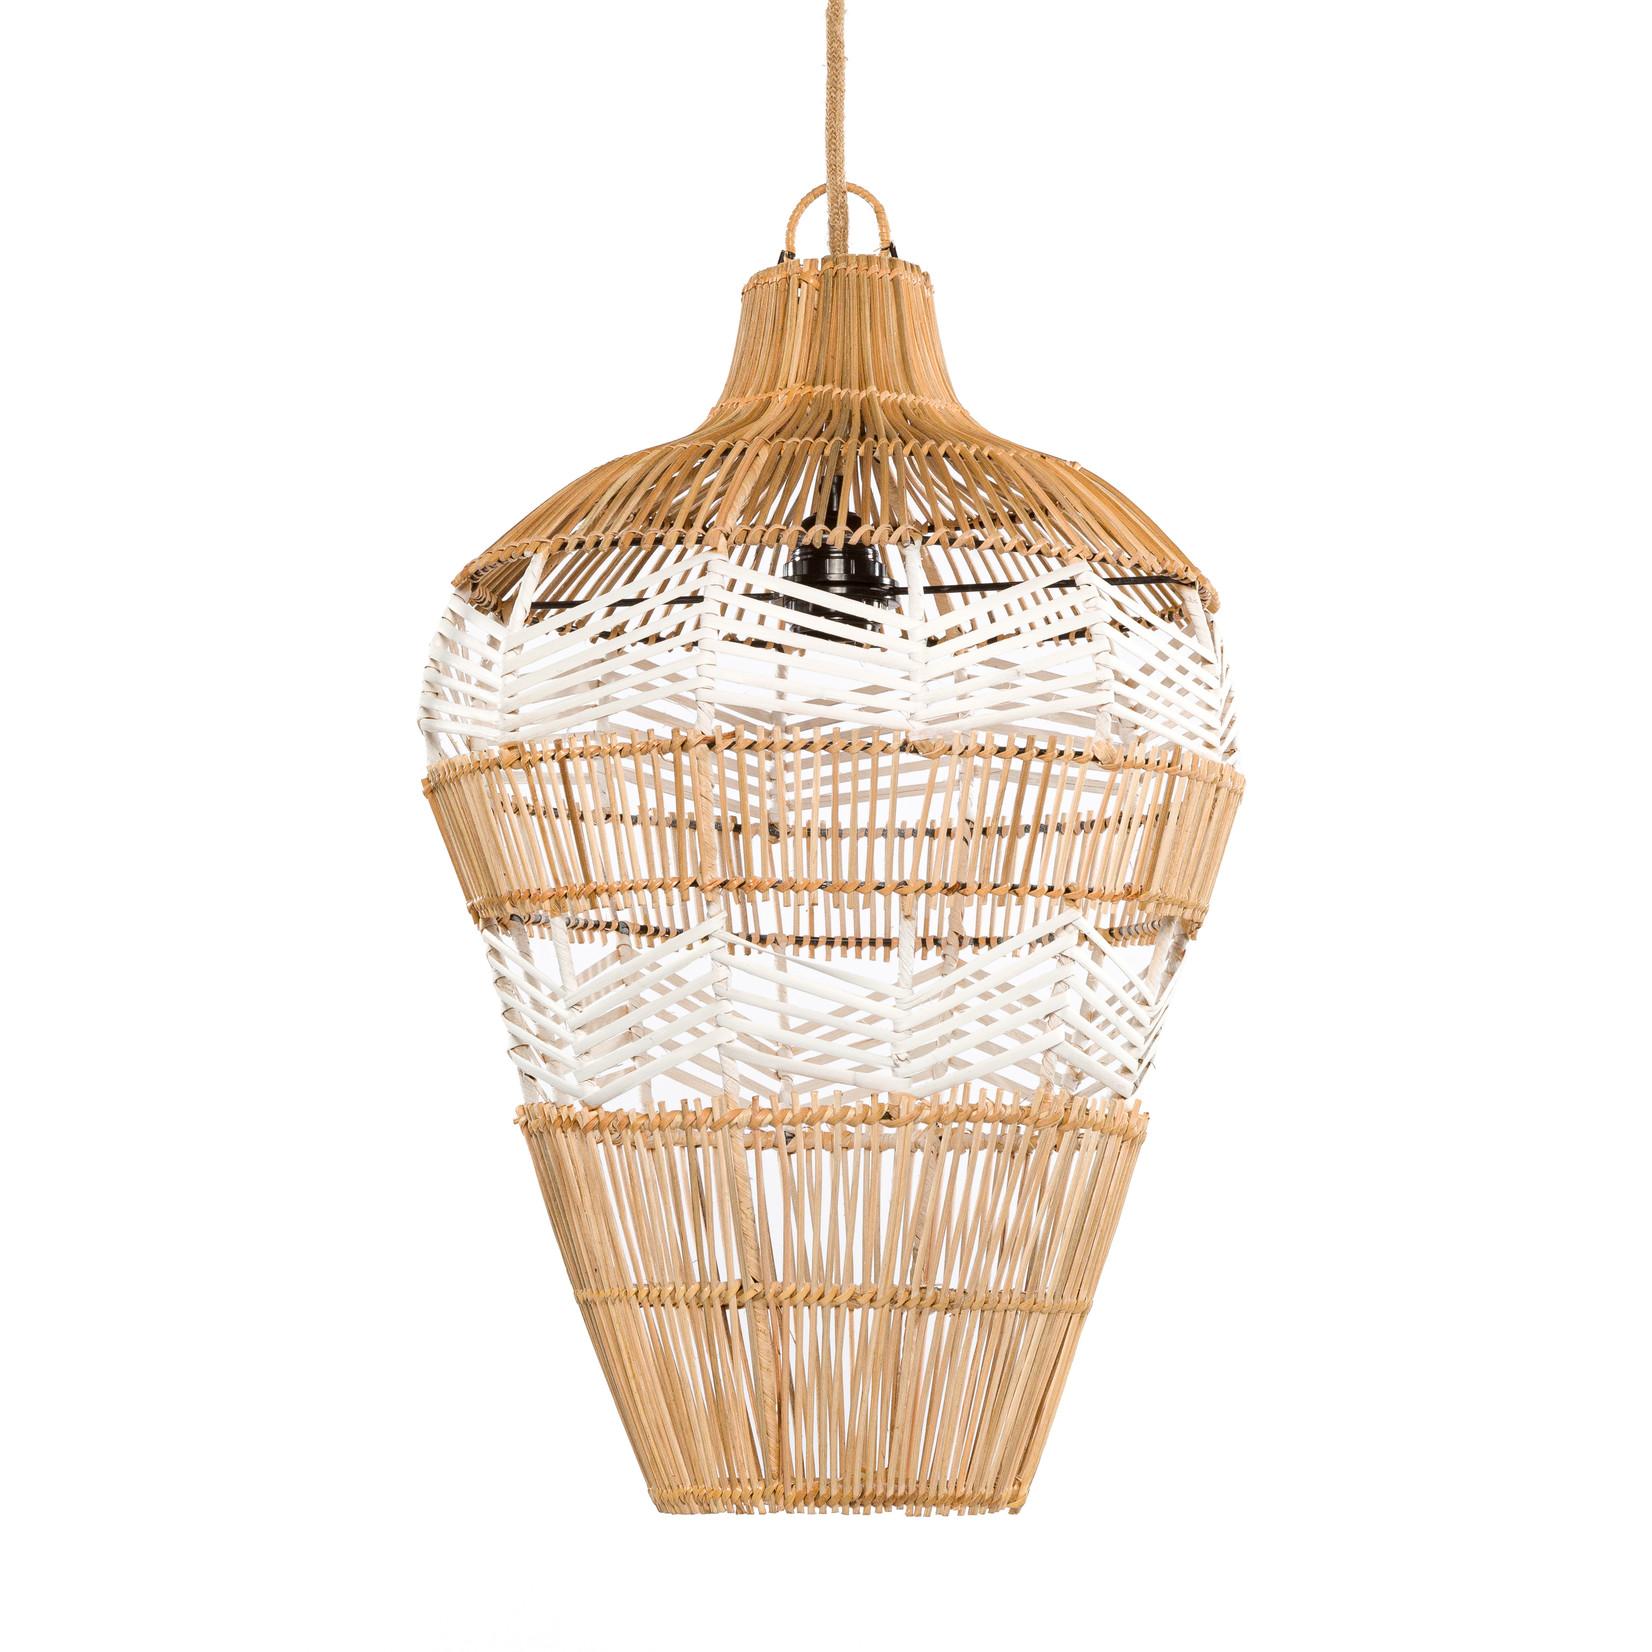 Bazar Bizar De Vase Hanglamp - Naturel Wit